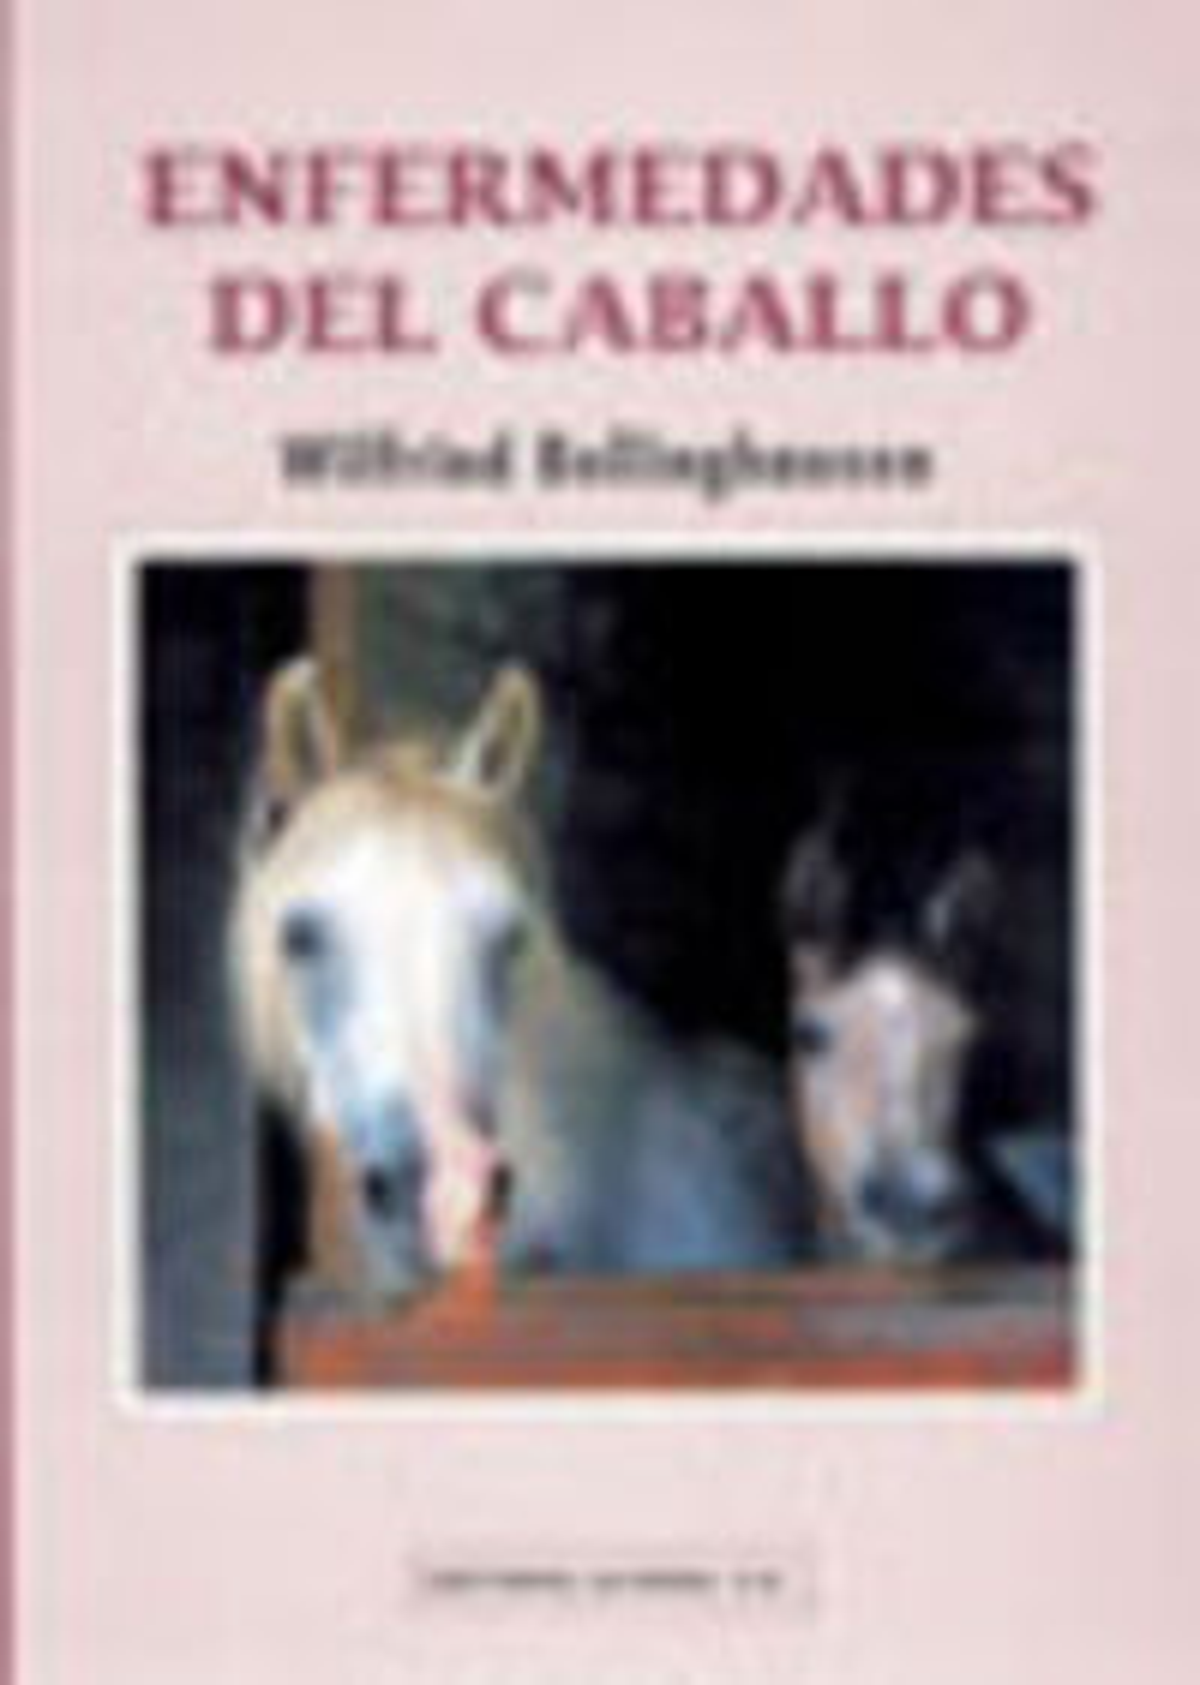 ENFERMEDADES DEL CABALLO